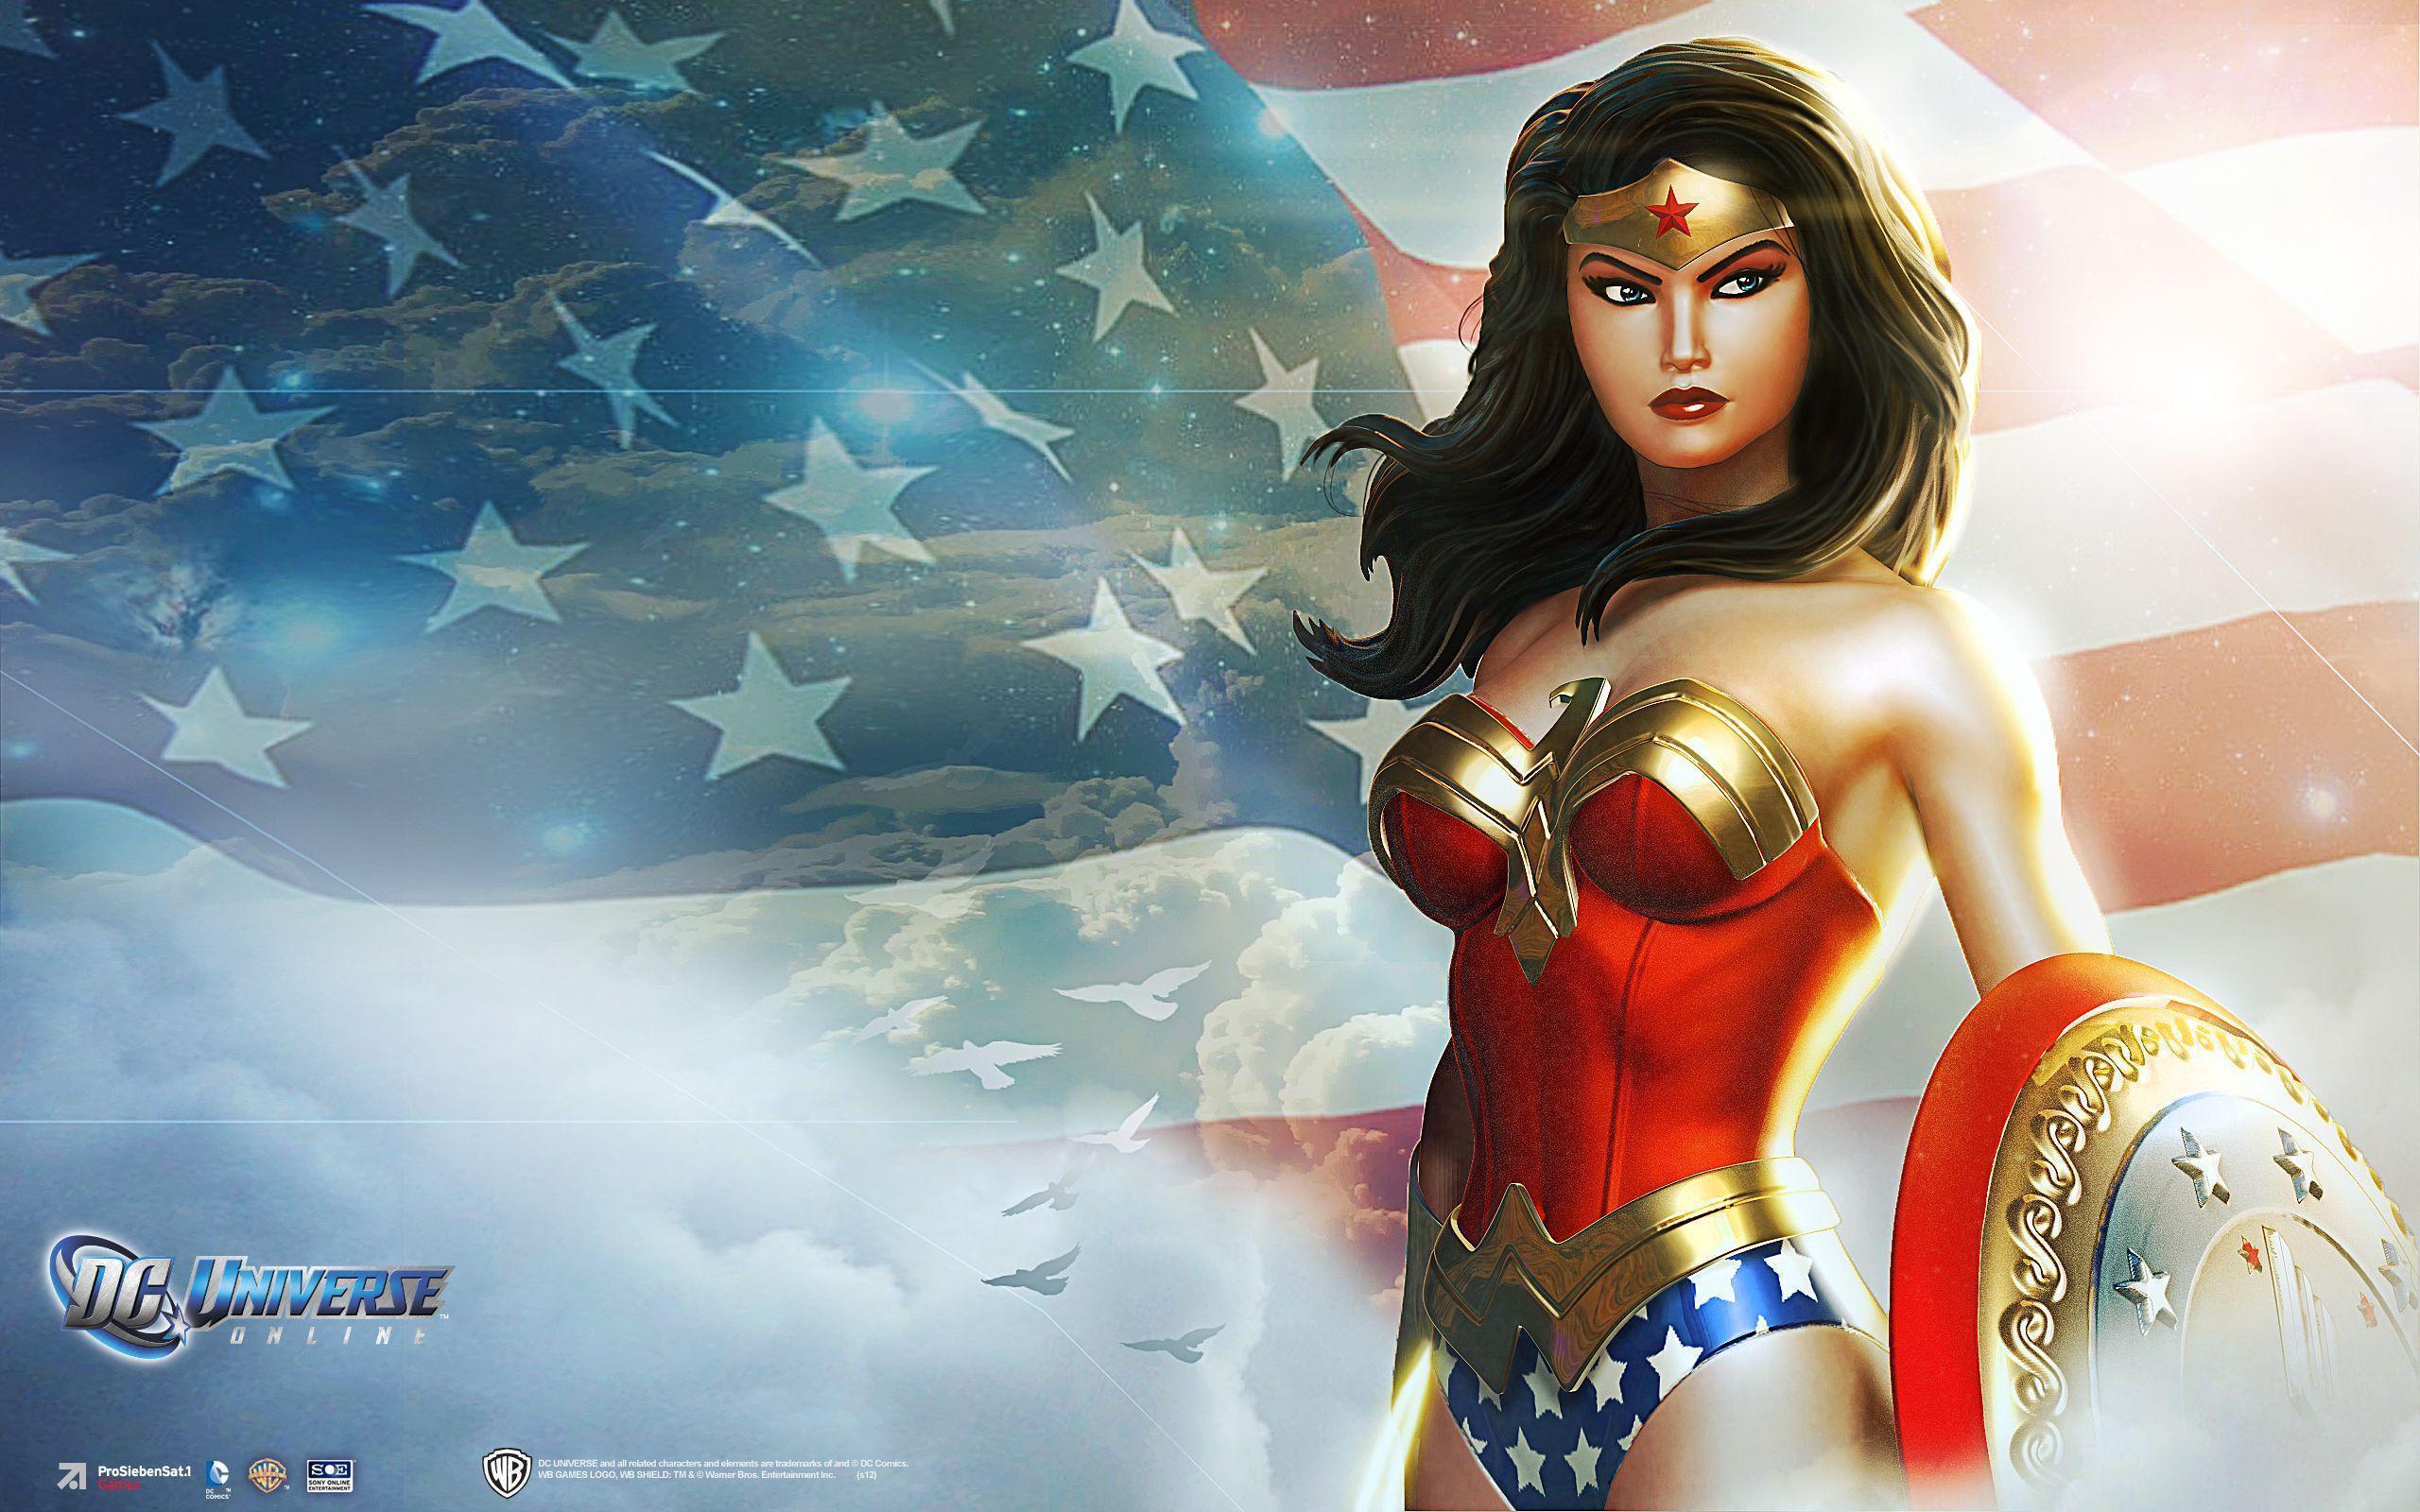 Wonder Woman Computer Wallpapers, Desktop Backgrounds | 2560x1600 ...